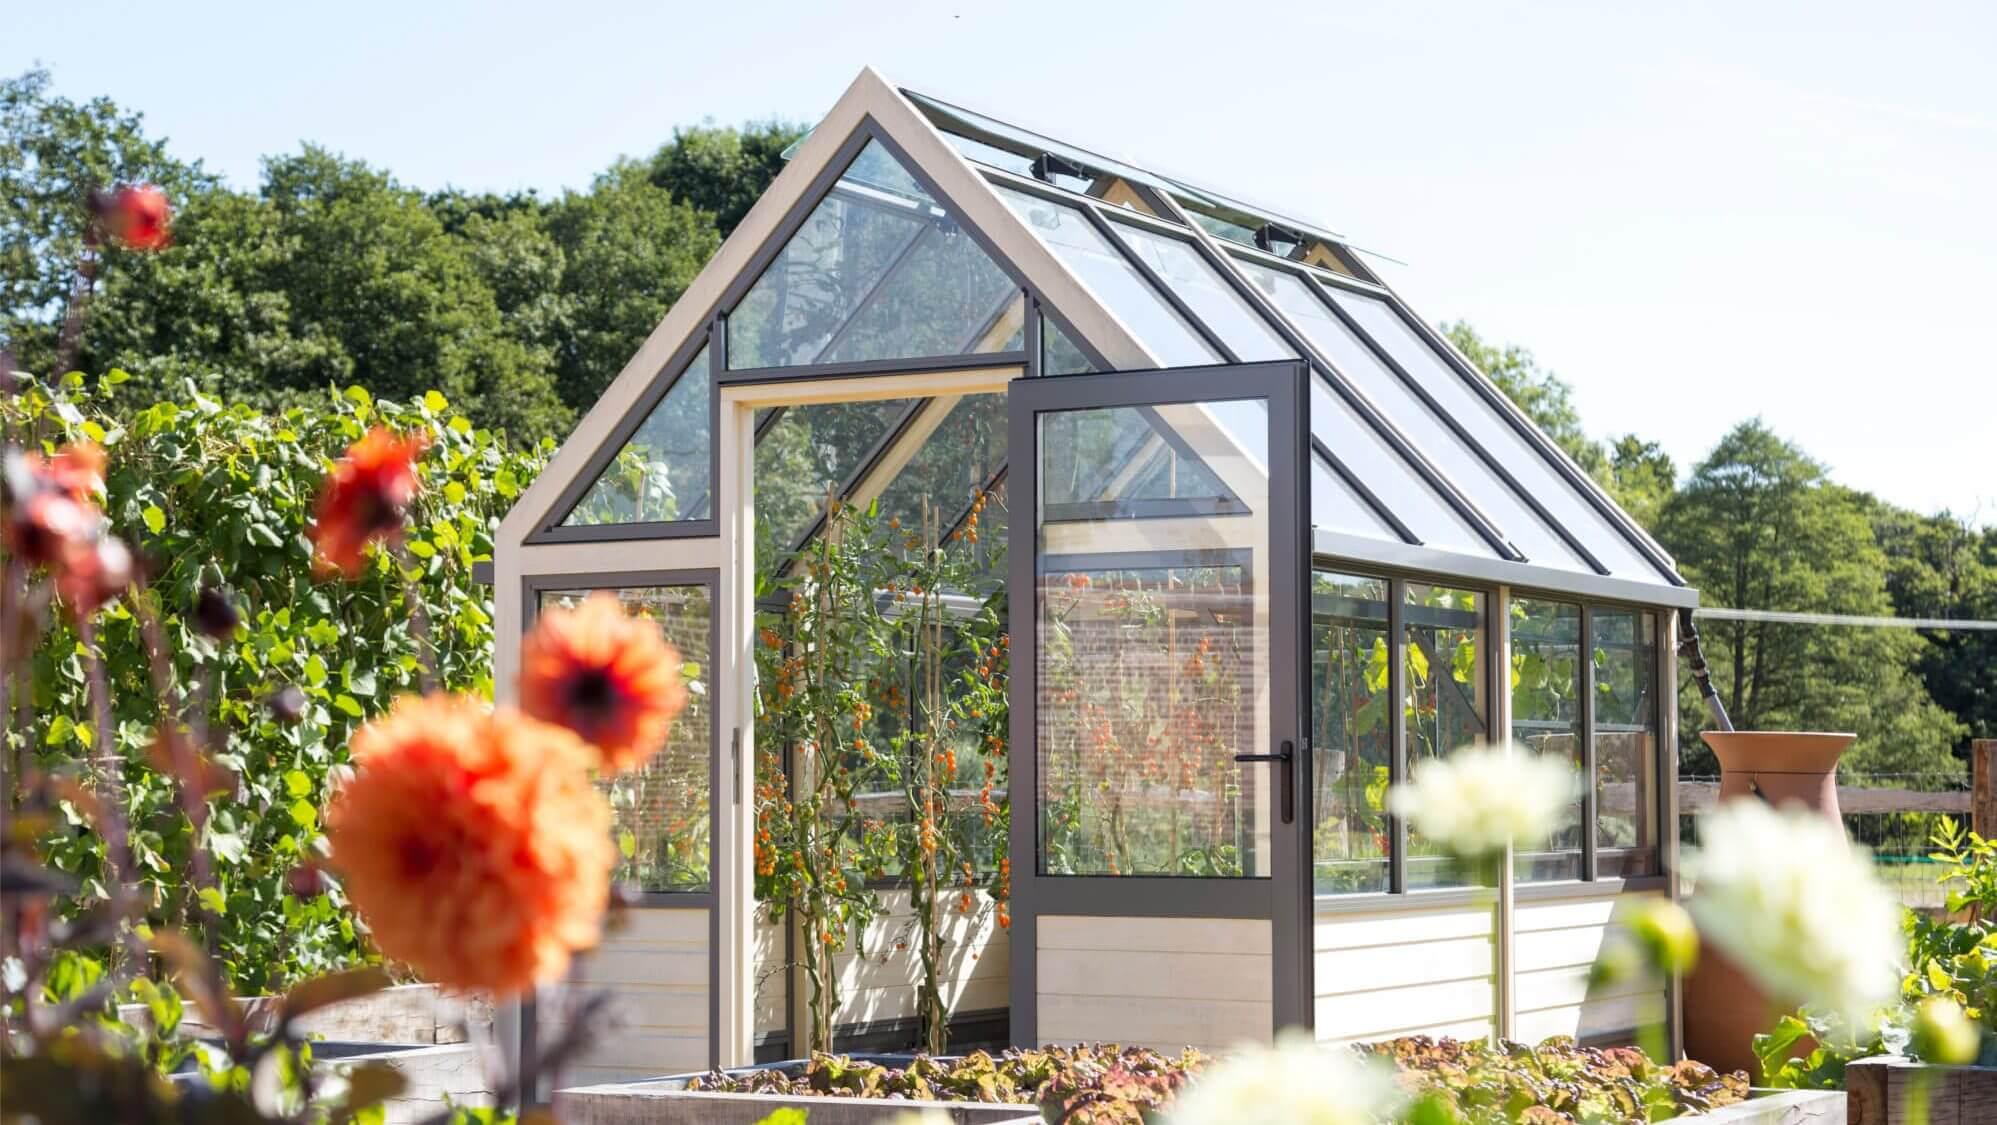 8 x 10 greenhouse